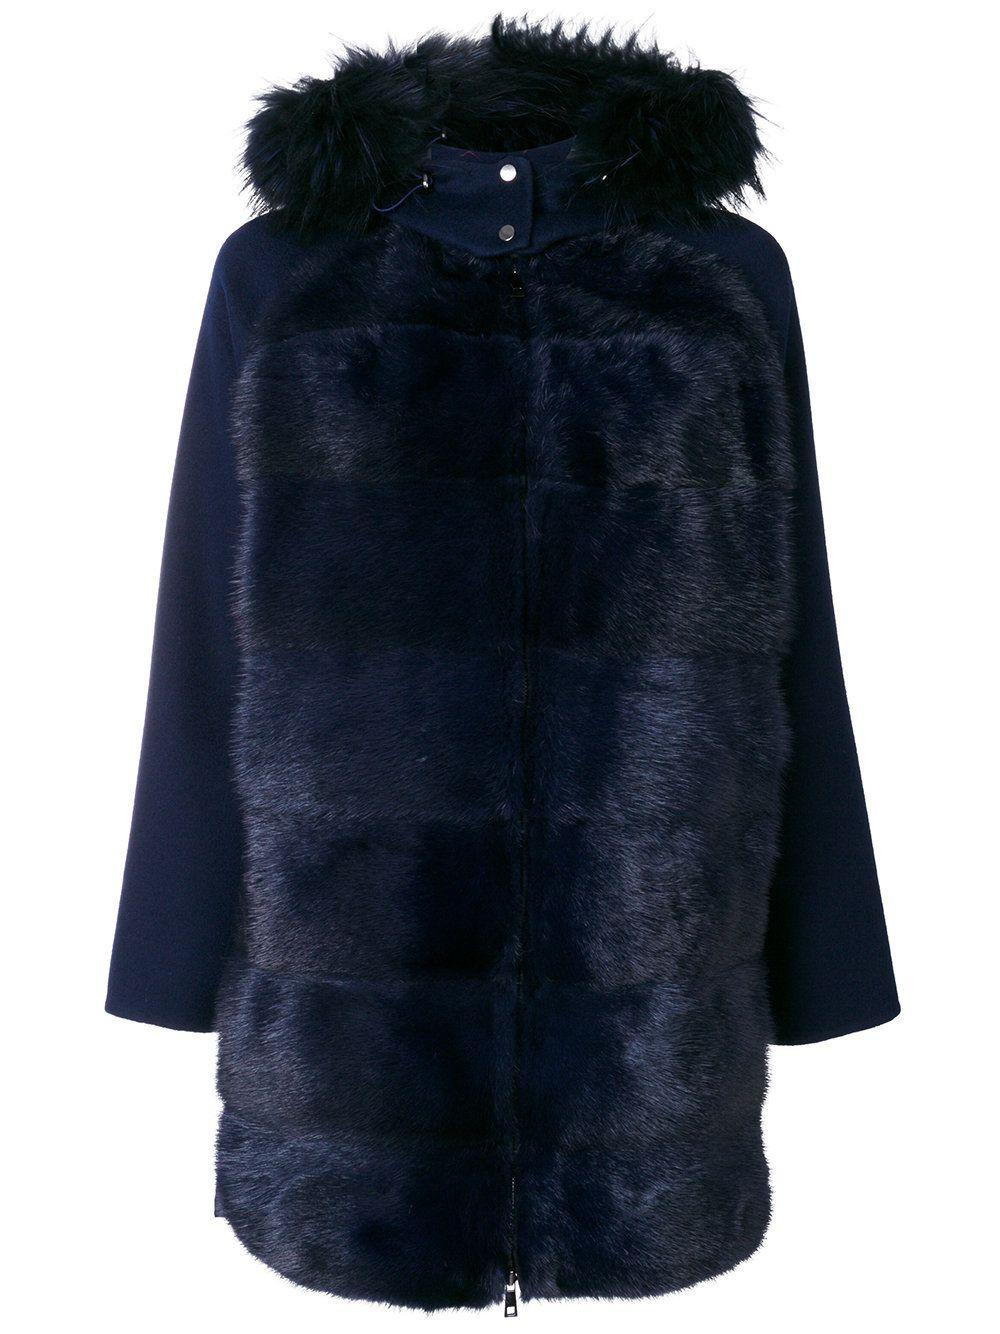 Parosh P.a.r.o.s.h. Linky Coat